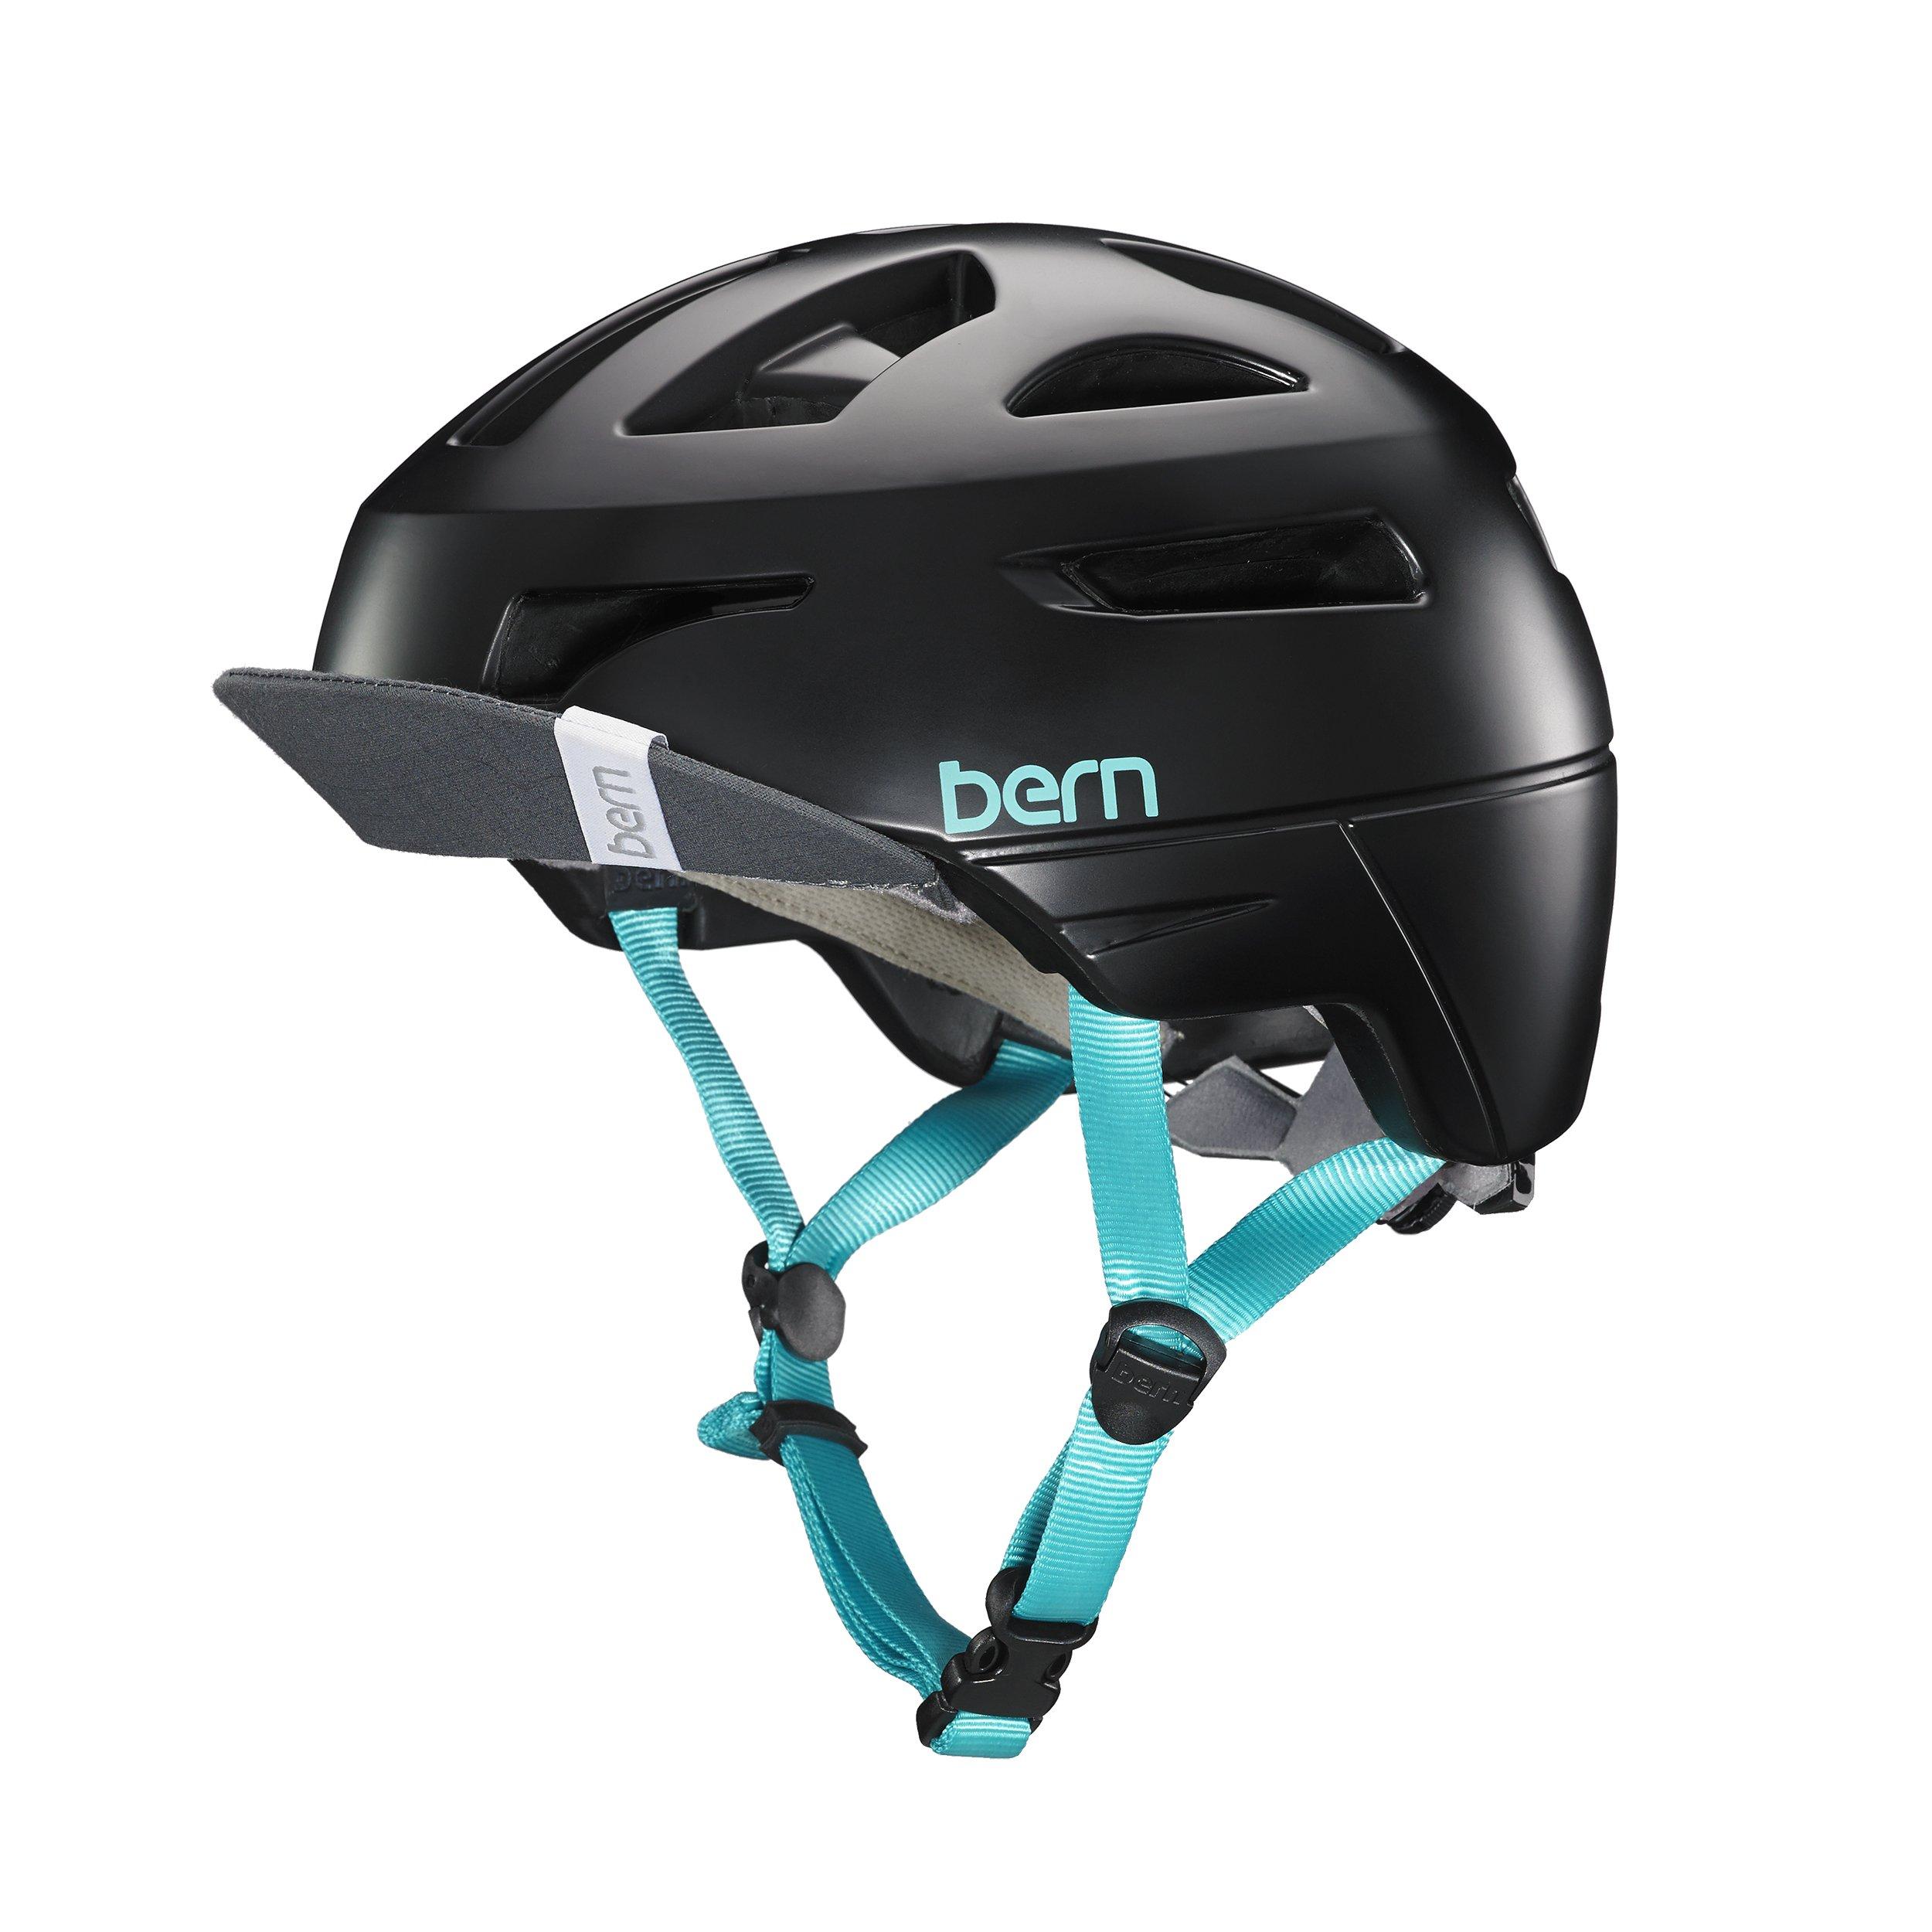 Bern Women's Parker MIPS Helmet w/ Flip Visor Satin Black L & Sweatband Bundle